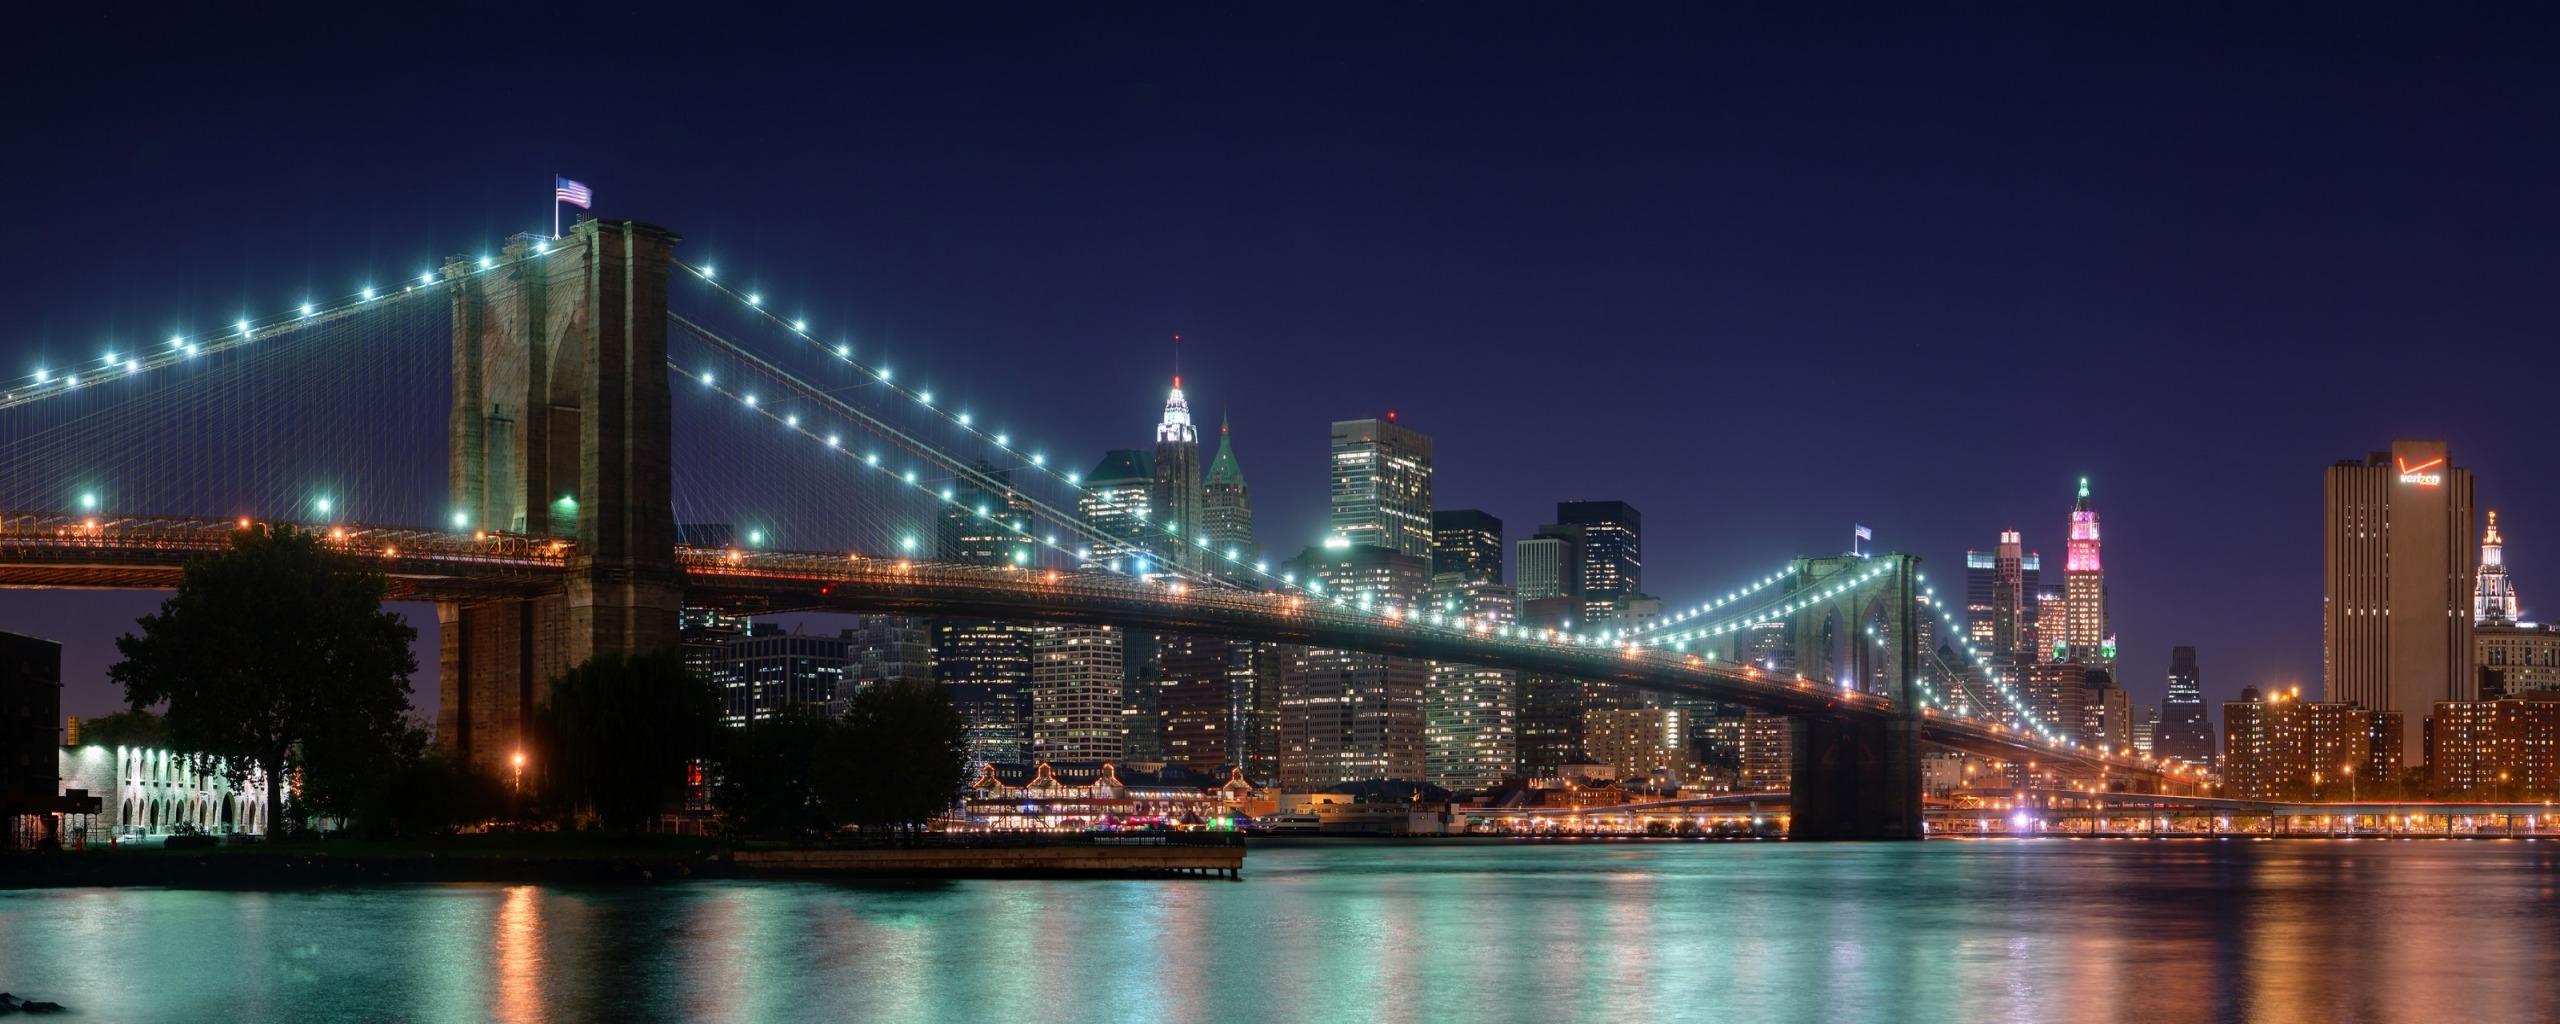 Brooklyn Bridge Panorama Full HD Wallpaper HD Wallpaper 2560x1024